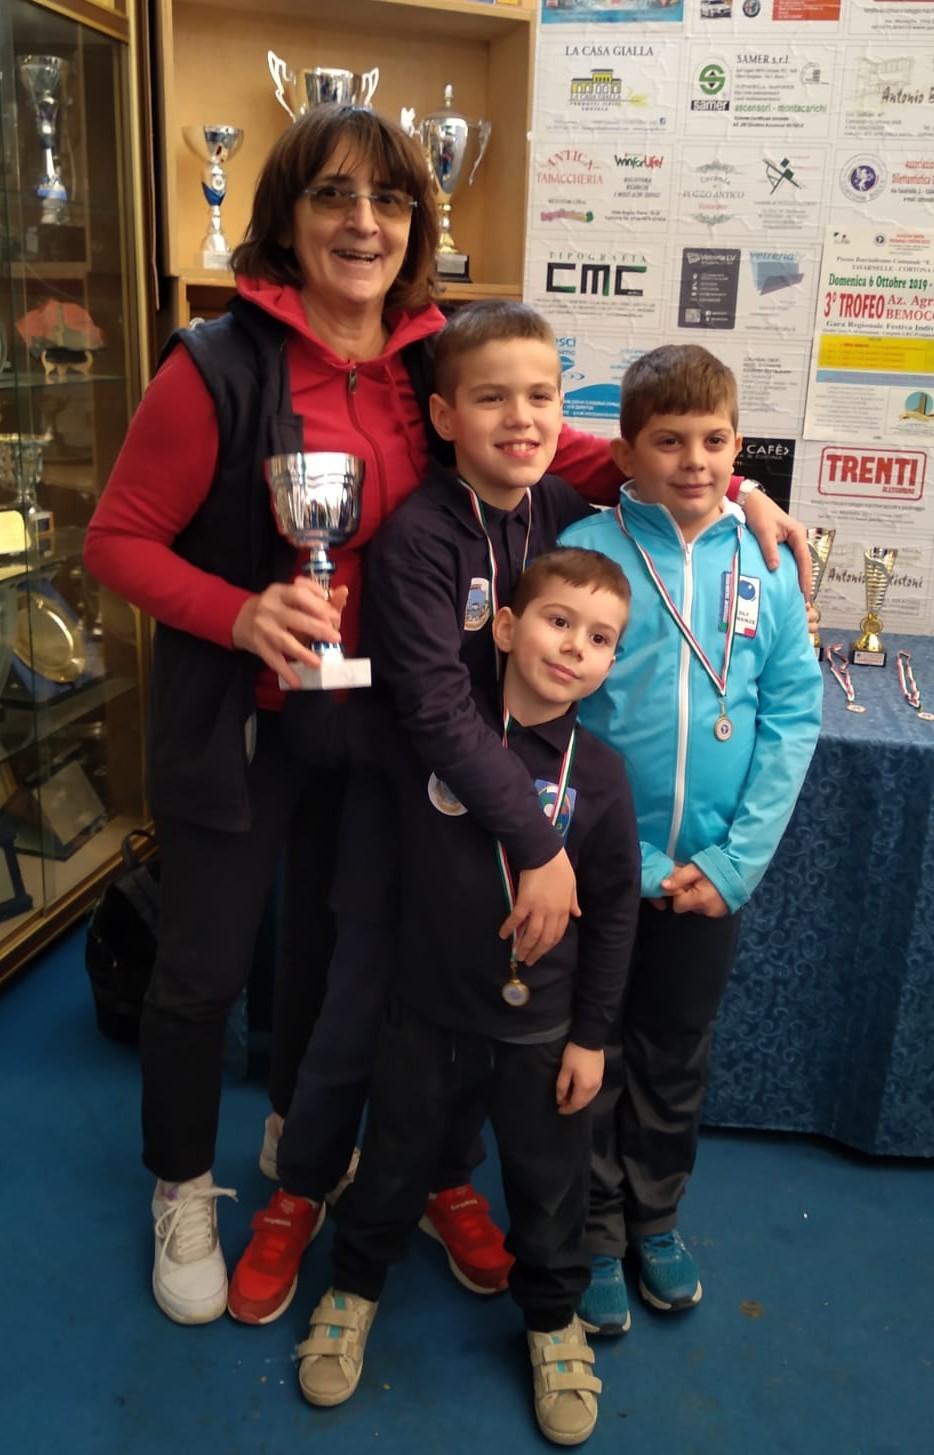 19 01 20 - Coppa Toscana Jun Tappa 4 Cortona (2)